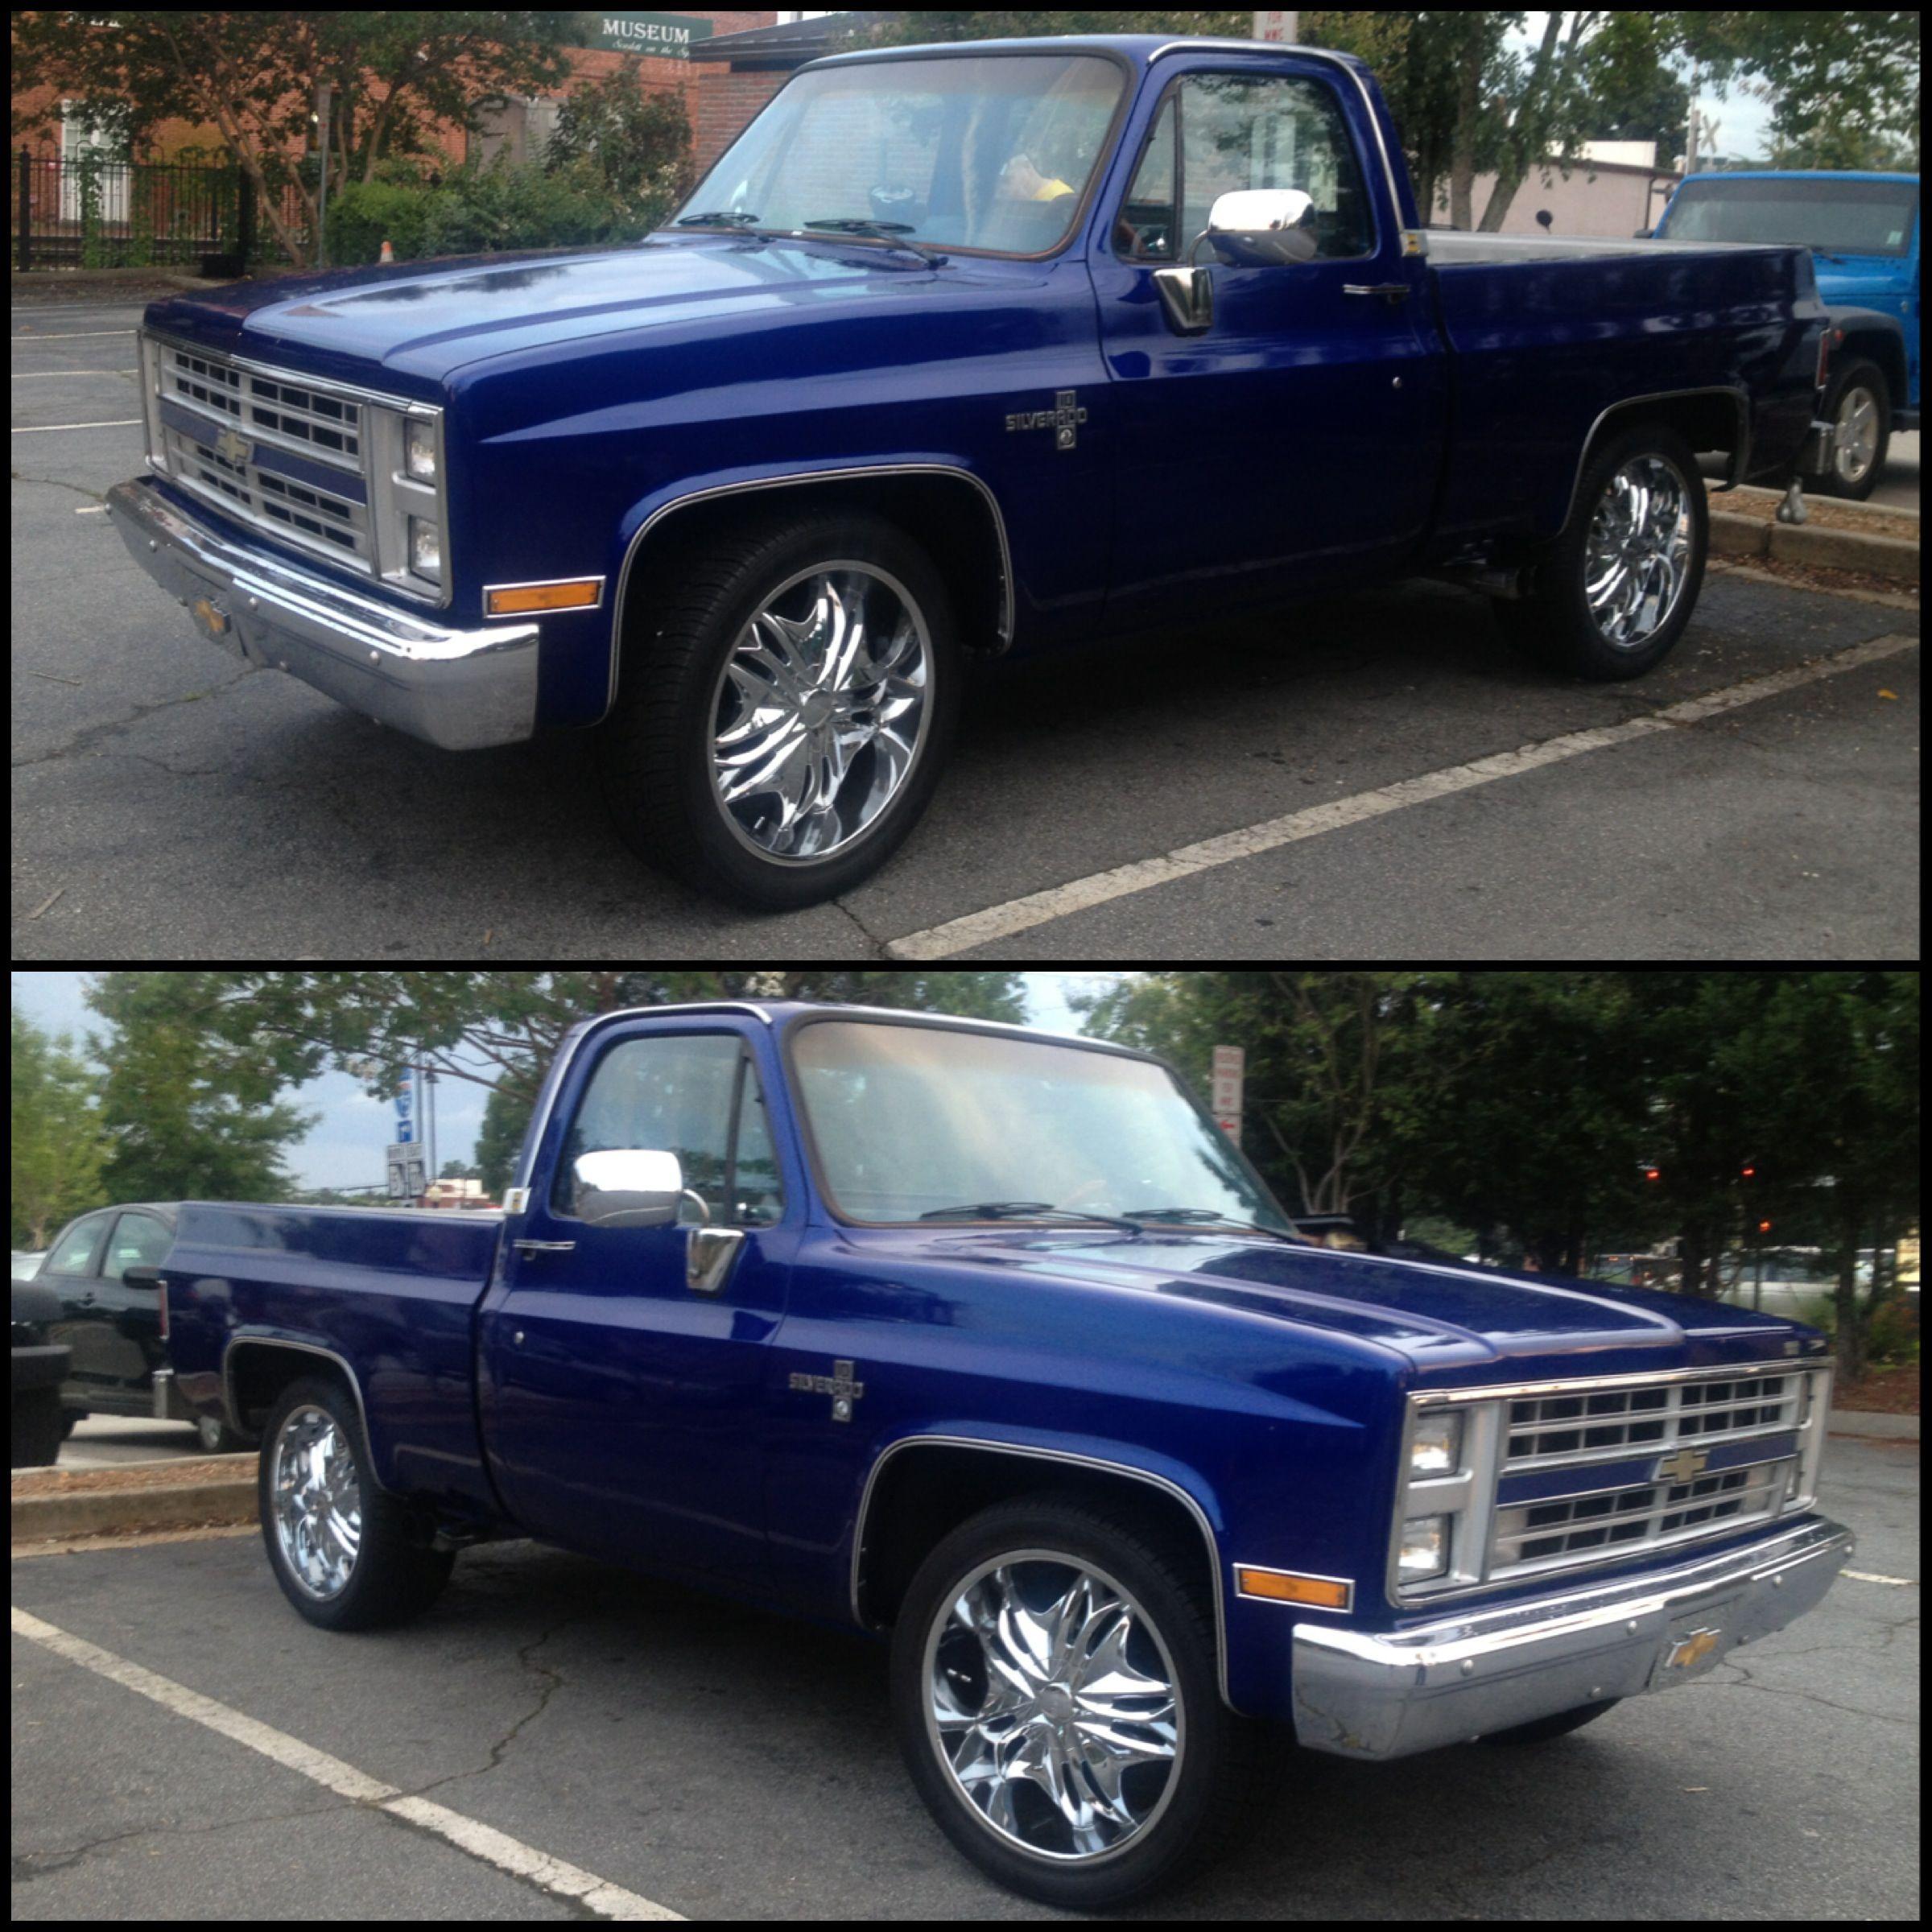 medium resolution of 1981 chevy silverado blue over blue 350 350